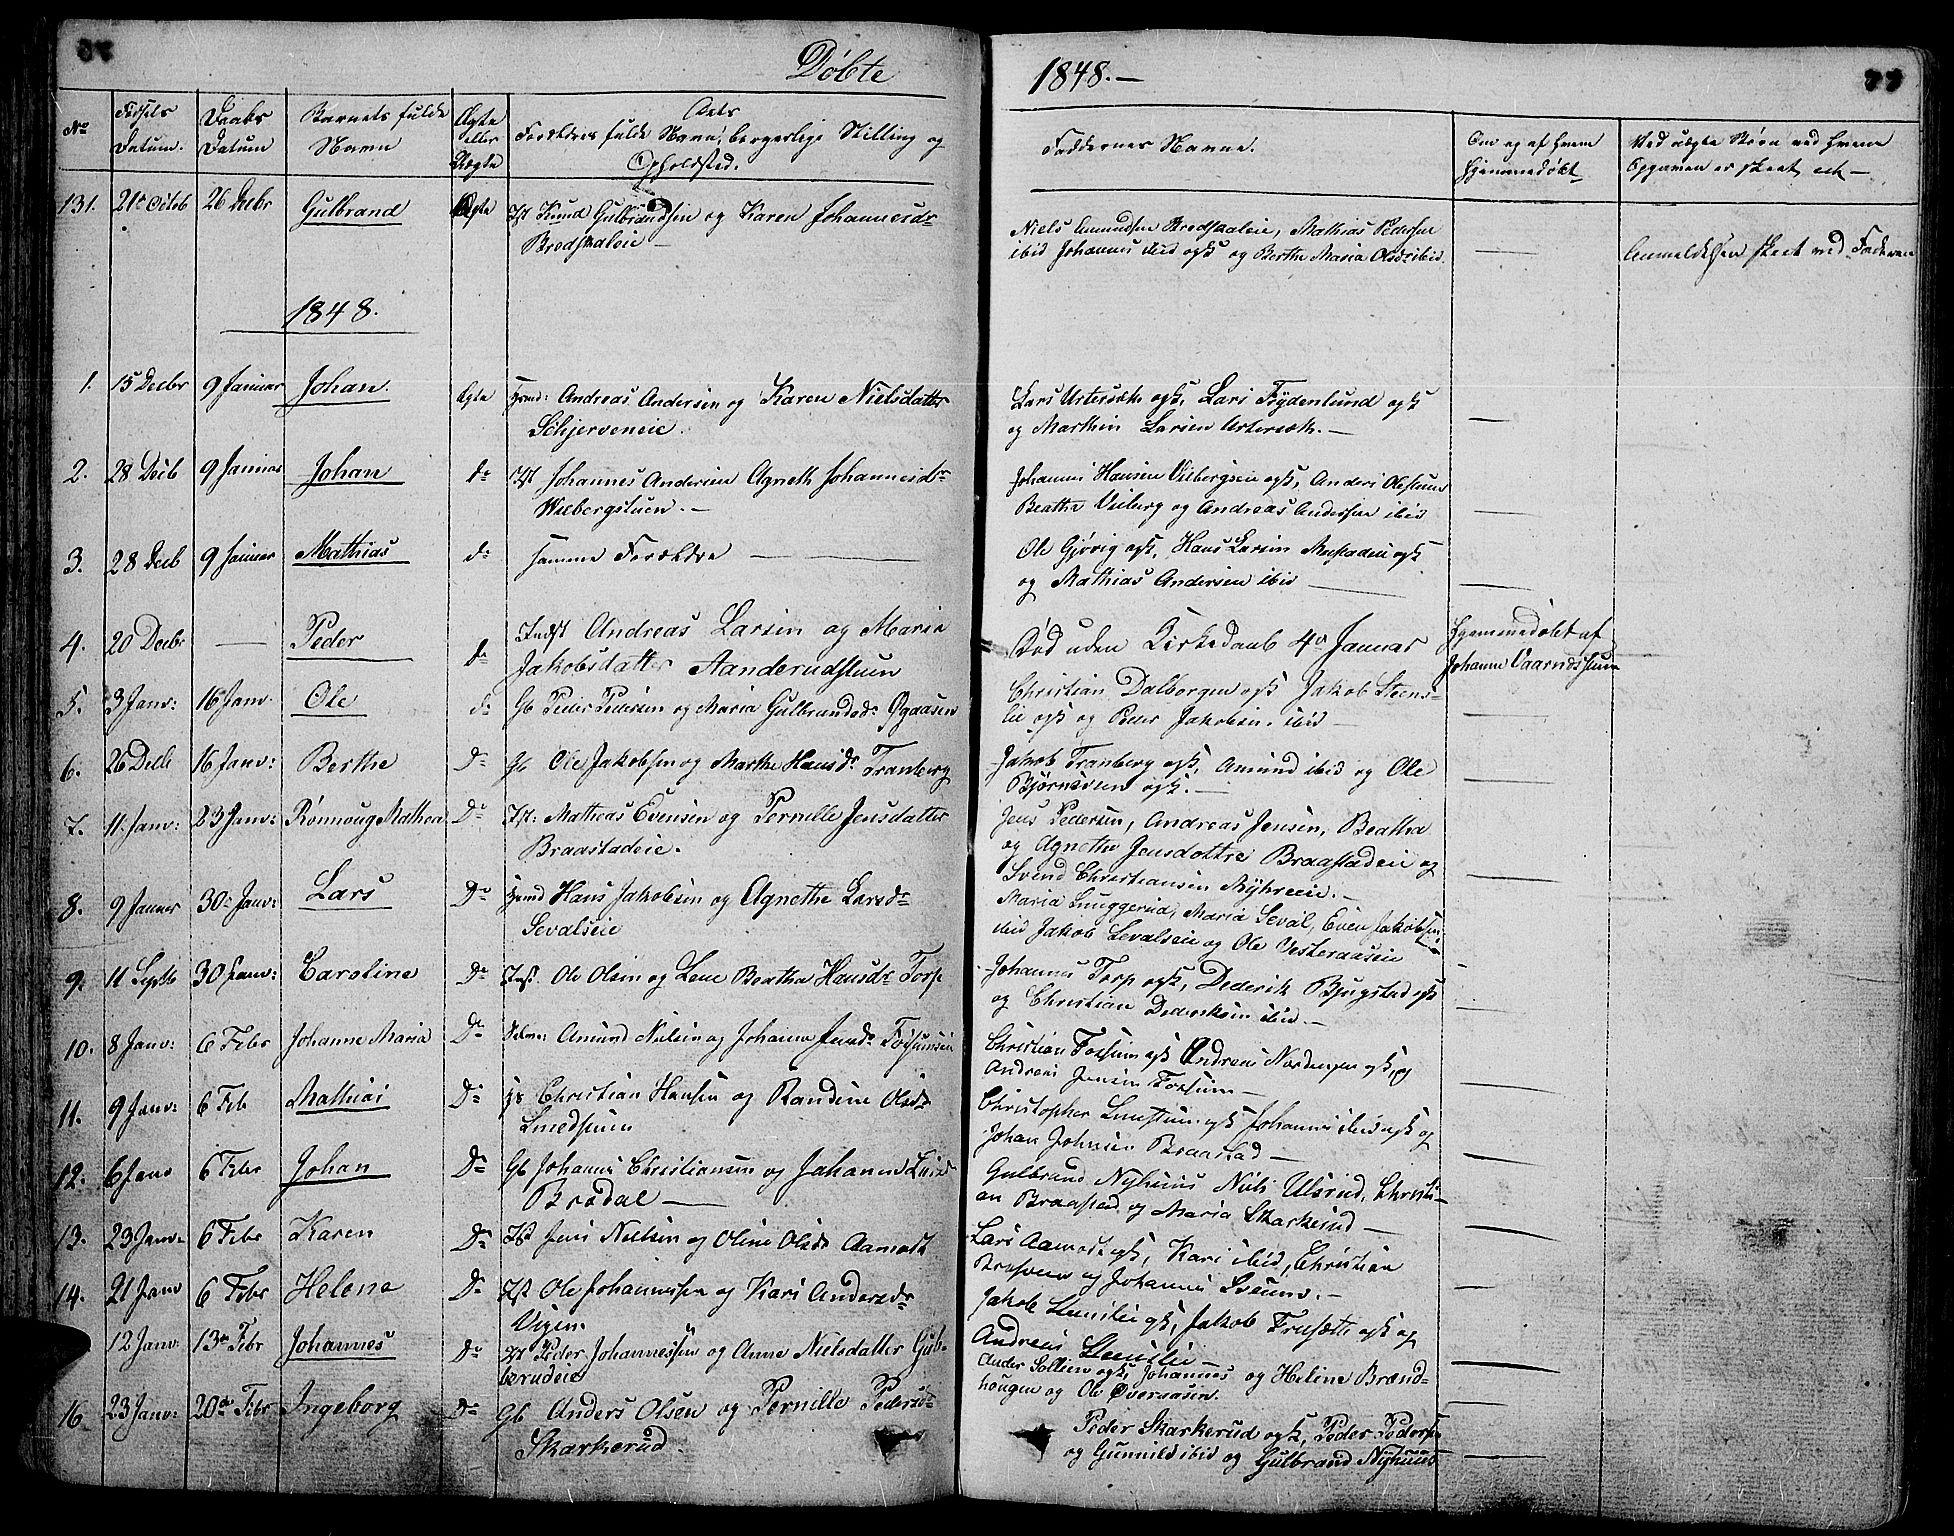 SAH, Vardal prestekontor, H/Ha/Hab/L0004: Klokkerbok nr. 4, 1831-1853, s. 77